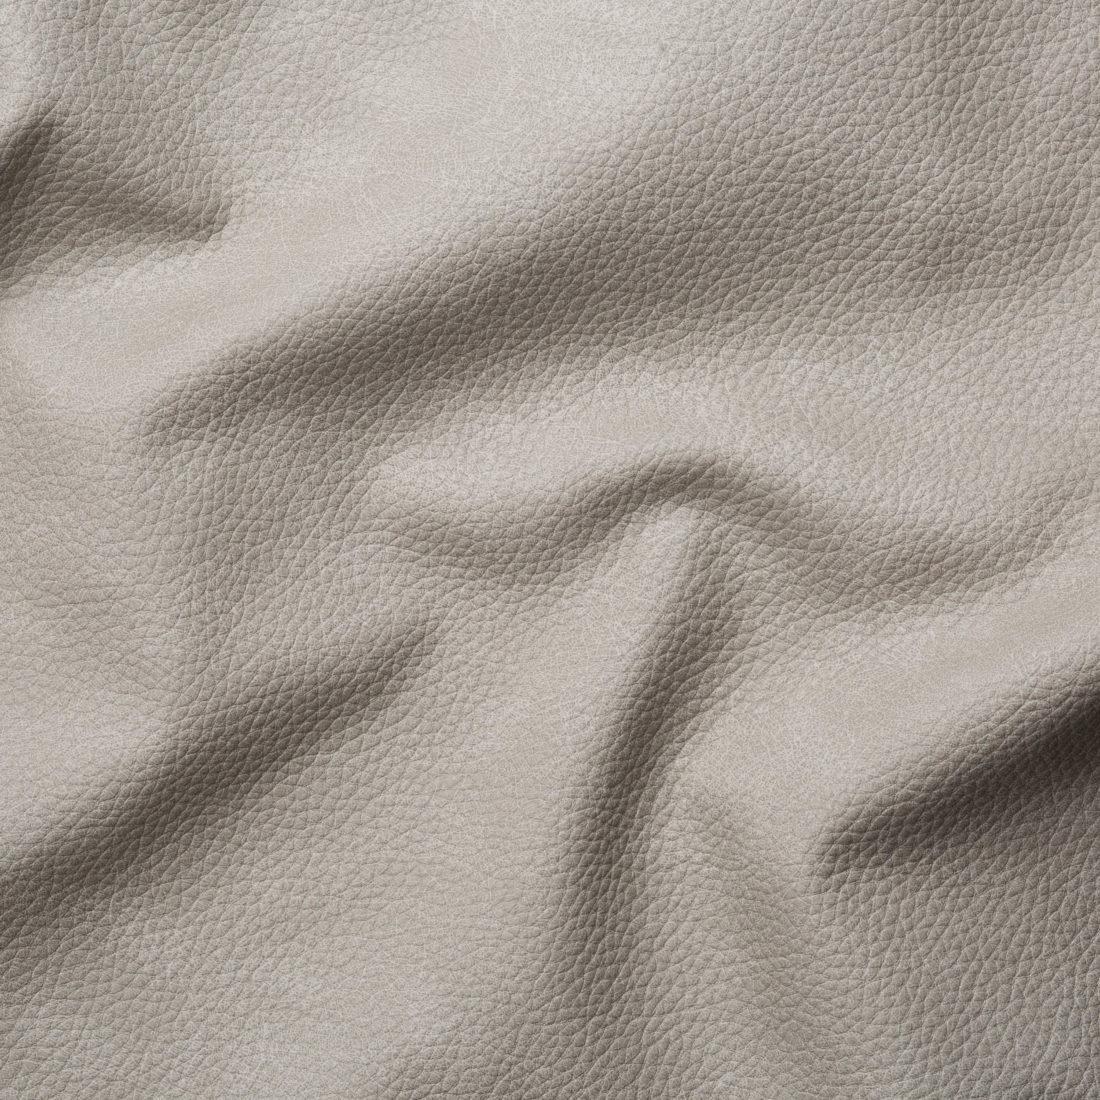 Меблева тканина Wave 109 Grey, штучна шкіра